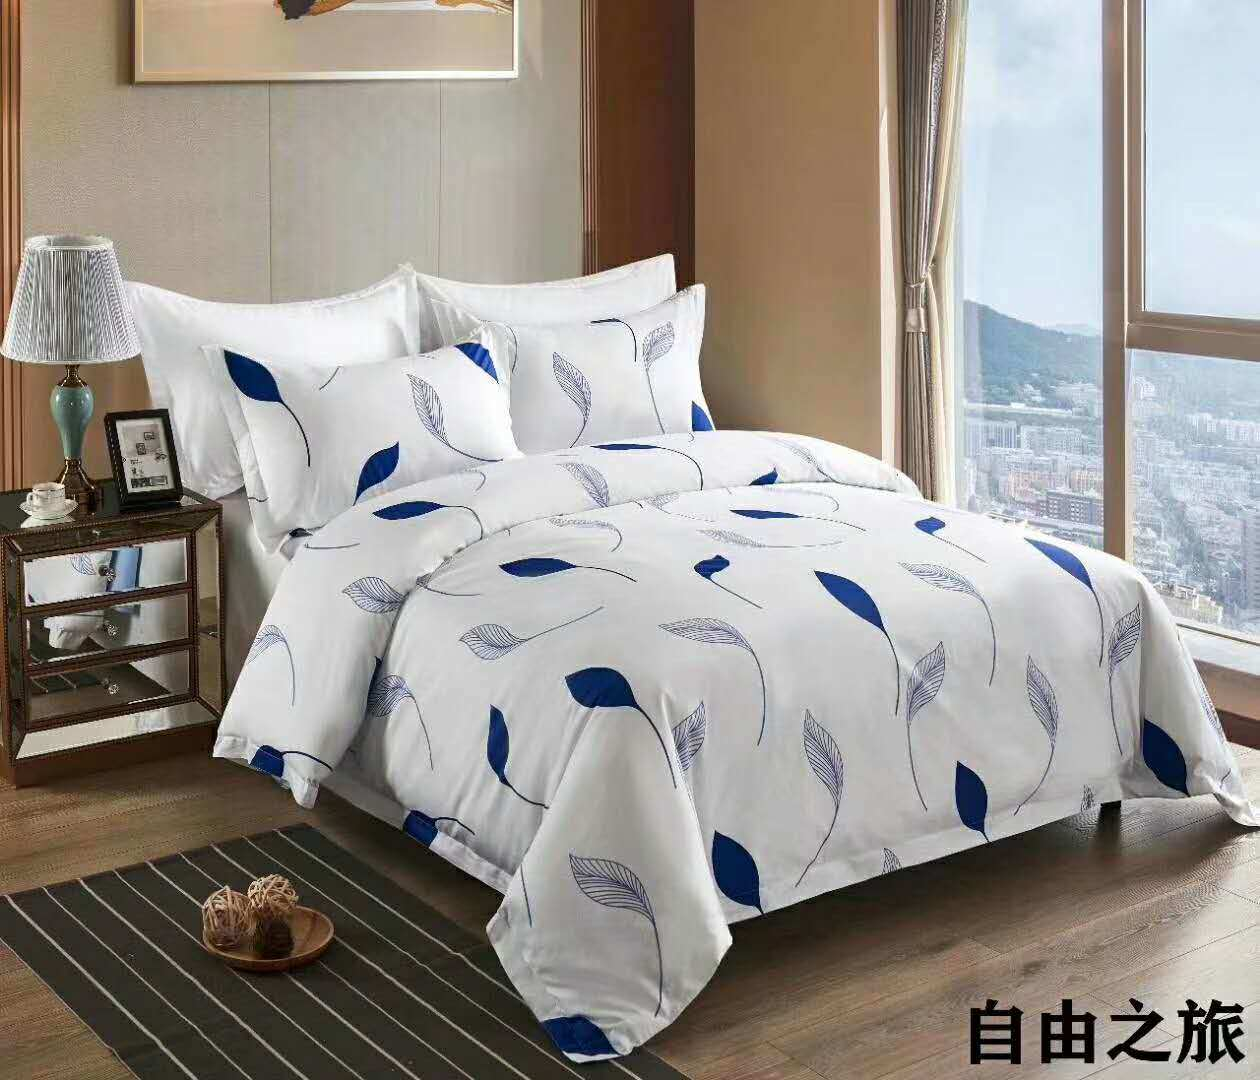 China Shenone 4 Pcs Hotel Linen White King Queen Bedsheet Luxury Bedding Set 100 Cotton Bed Sheet China Queen Bedsheet And White King Queen Bedsheet Price